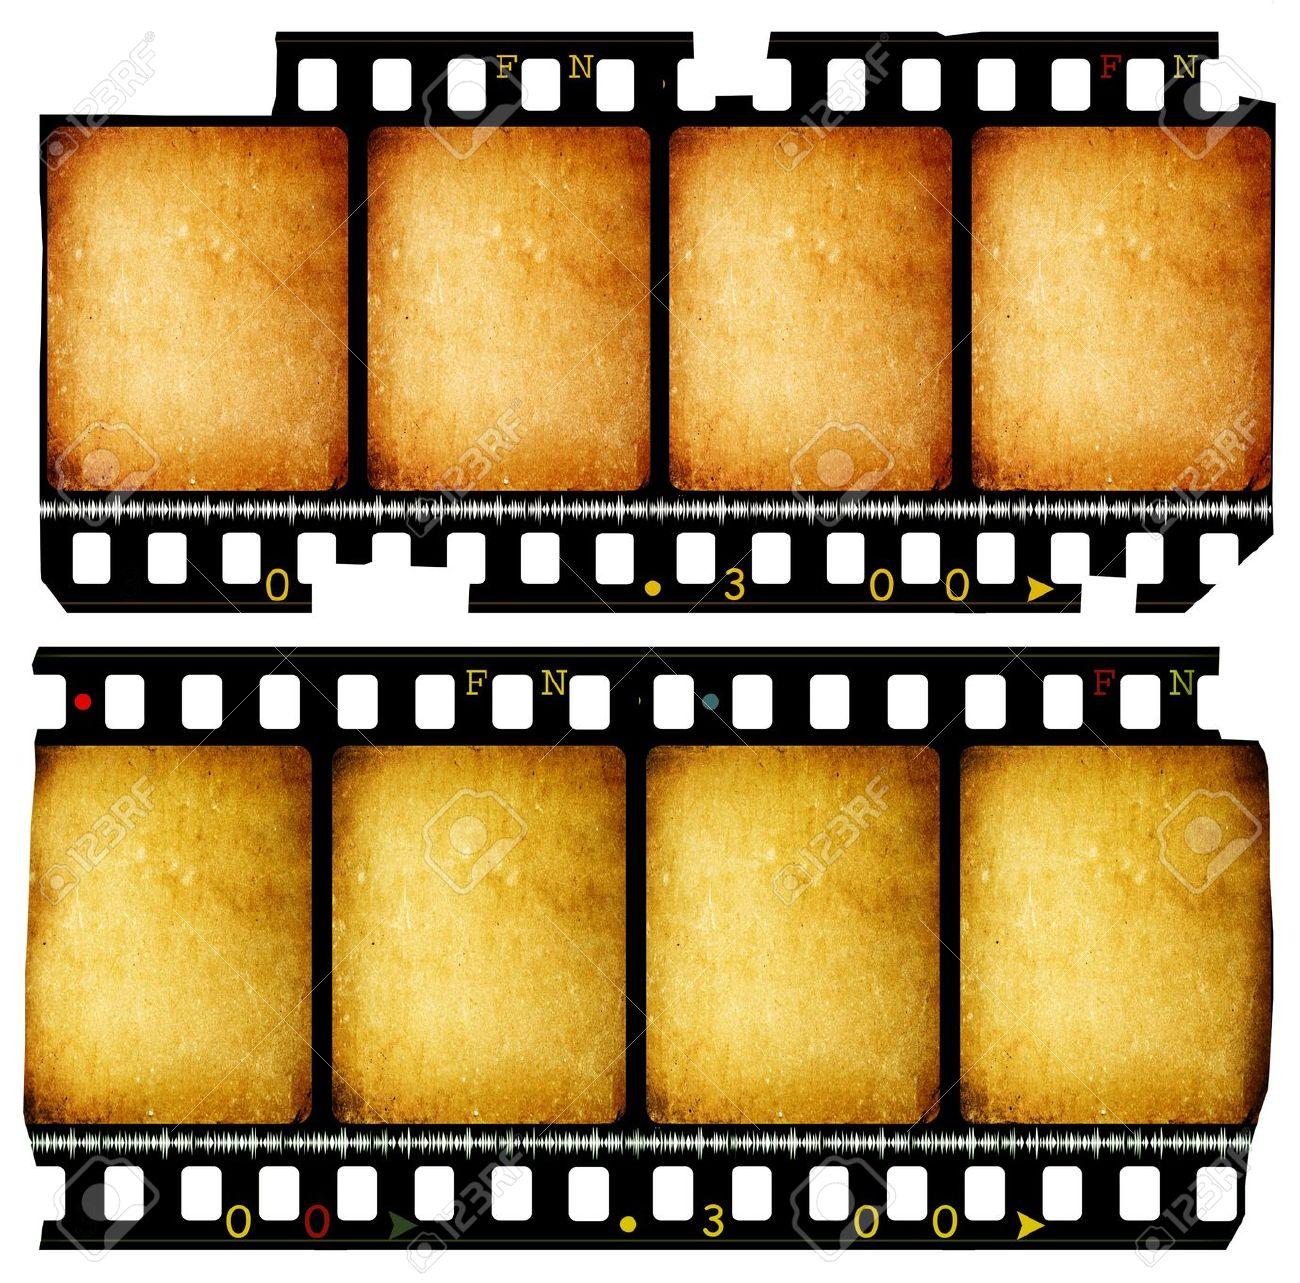 Close up of vintage movie film strips - 10658415